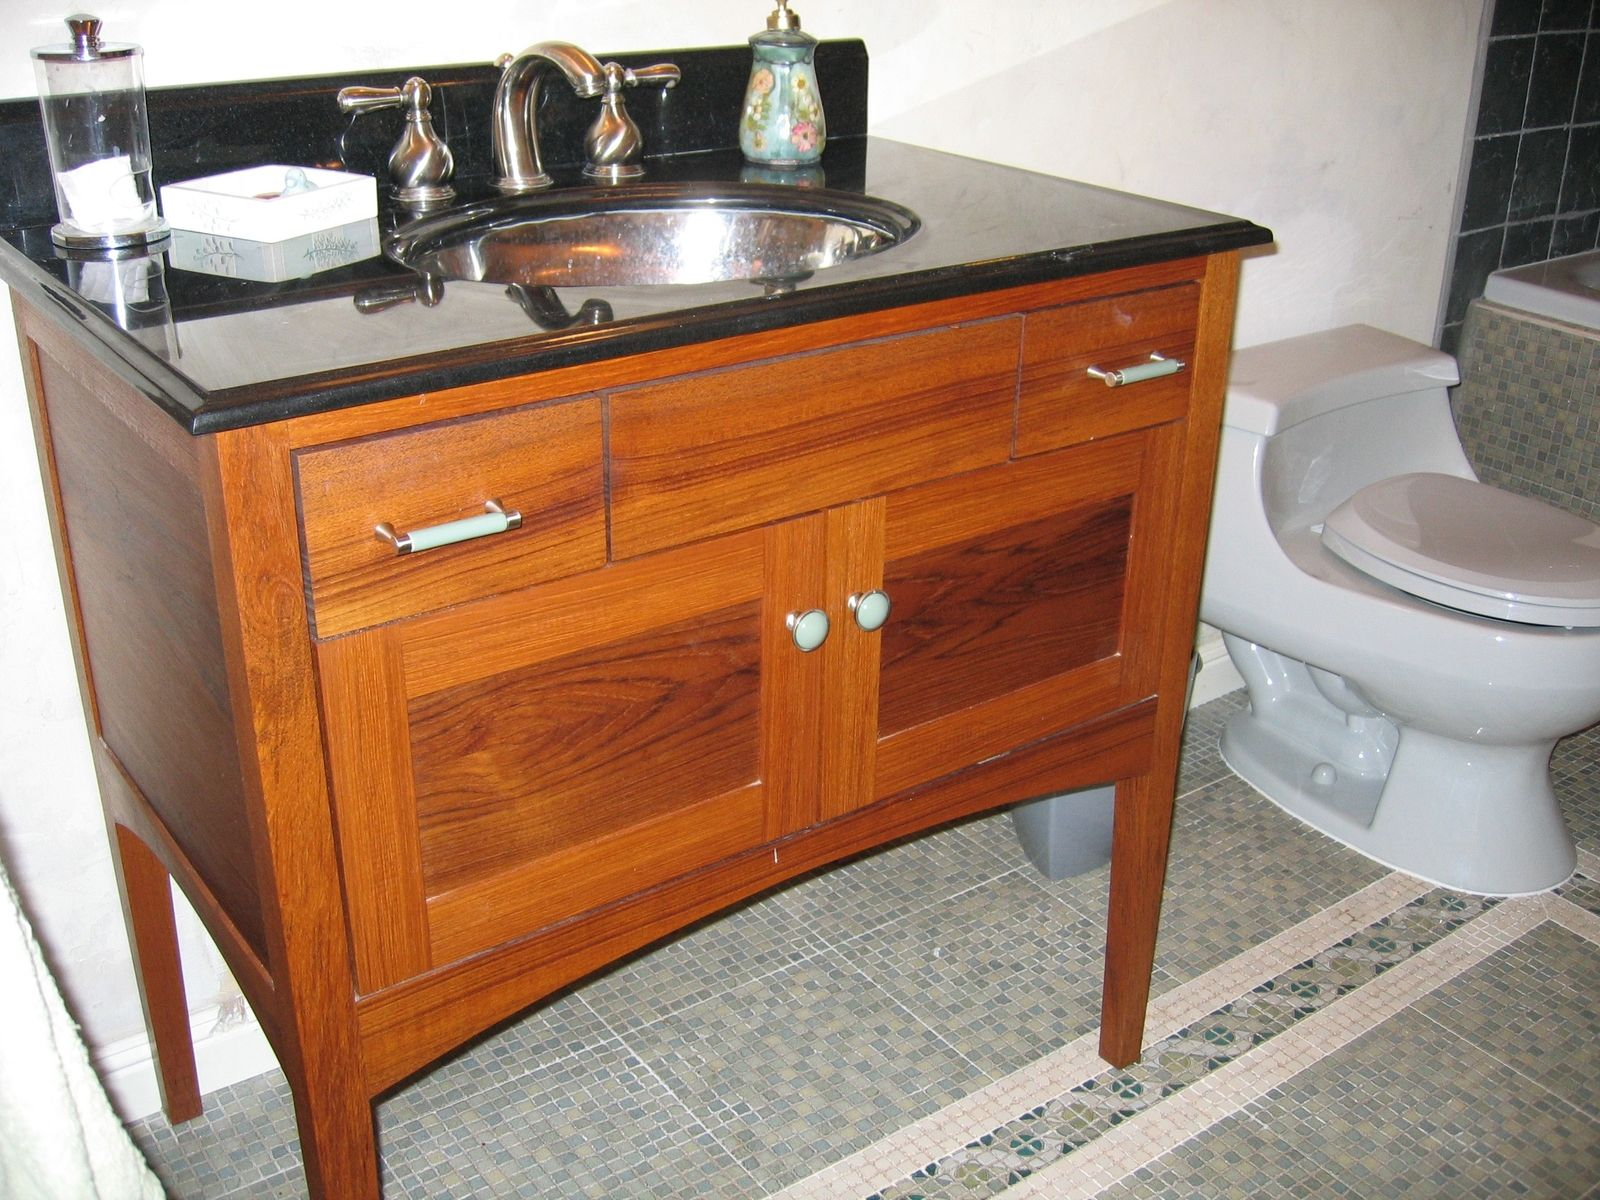 Hand Crafted Custom Teak FurnitureStyle Bathroom Vanity